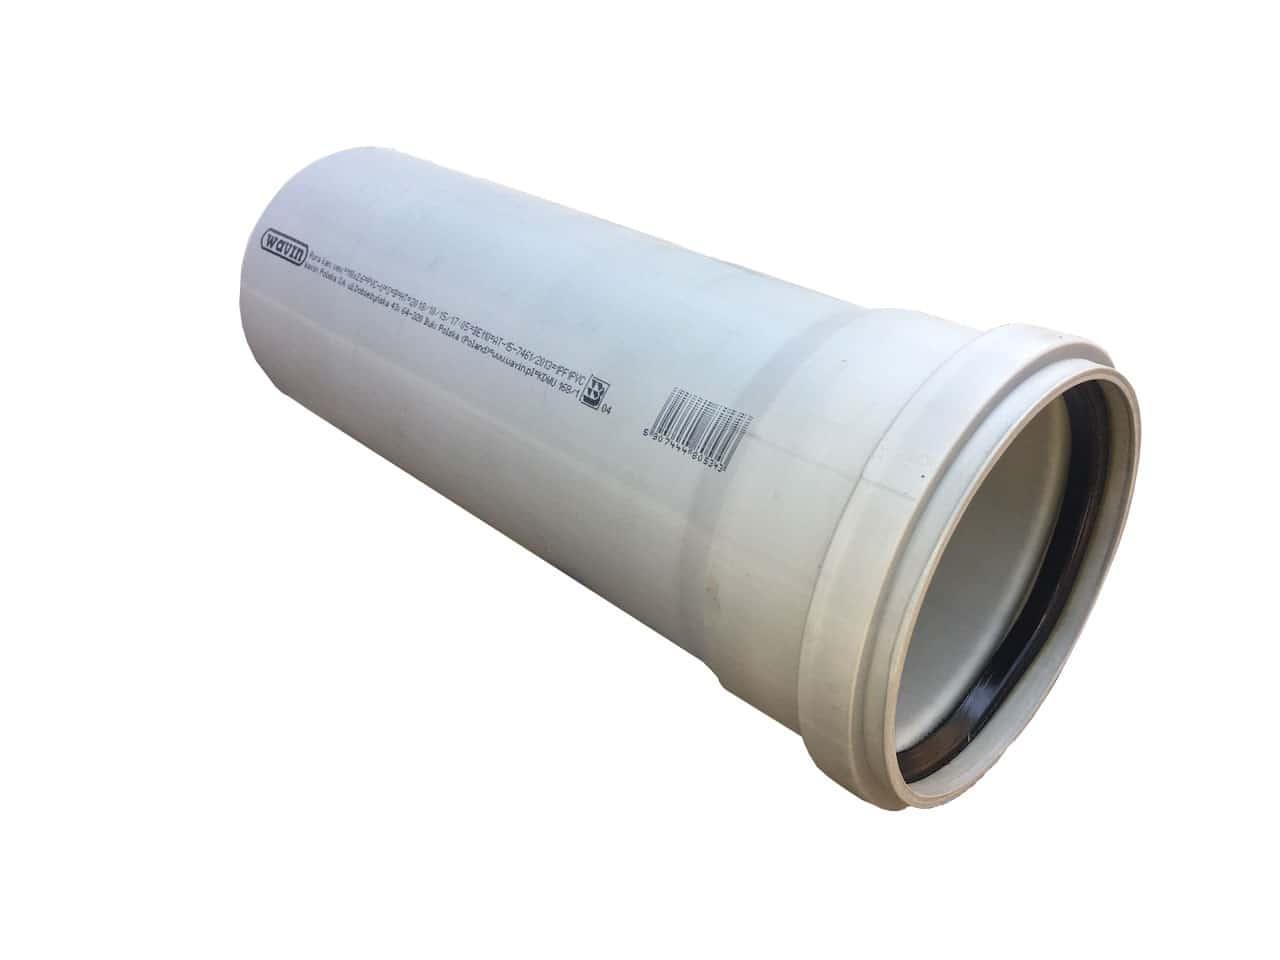 Труба для внутренней канализации 110*0 5 метра wavin